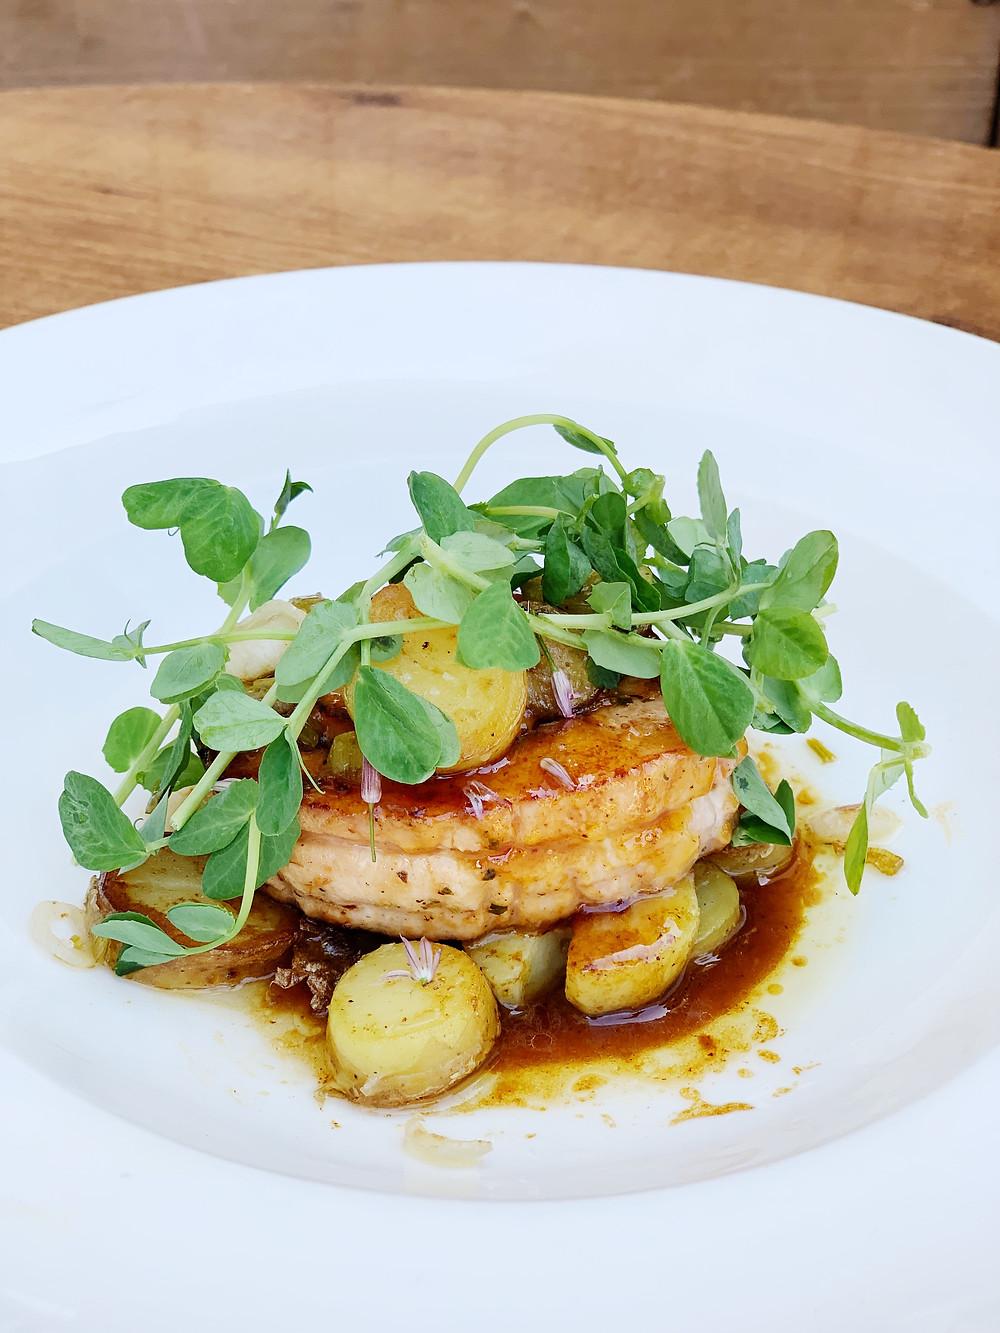 roast pork loin bacon marmalade, spring allium ragoût, fingerling potatoes, apricot glaze